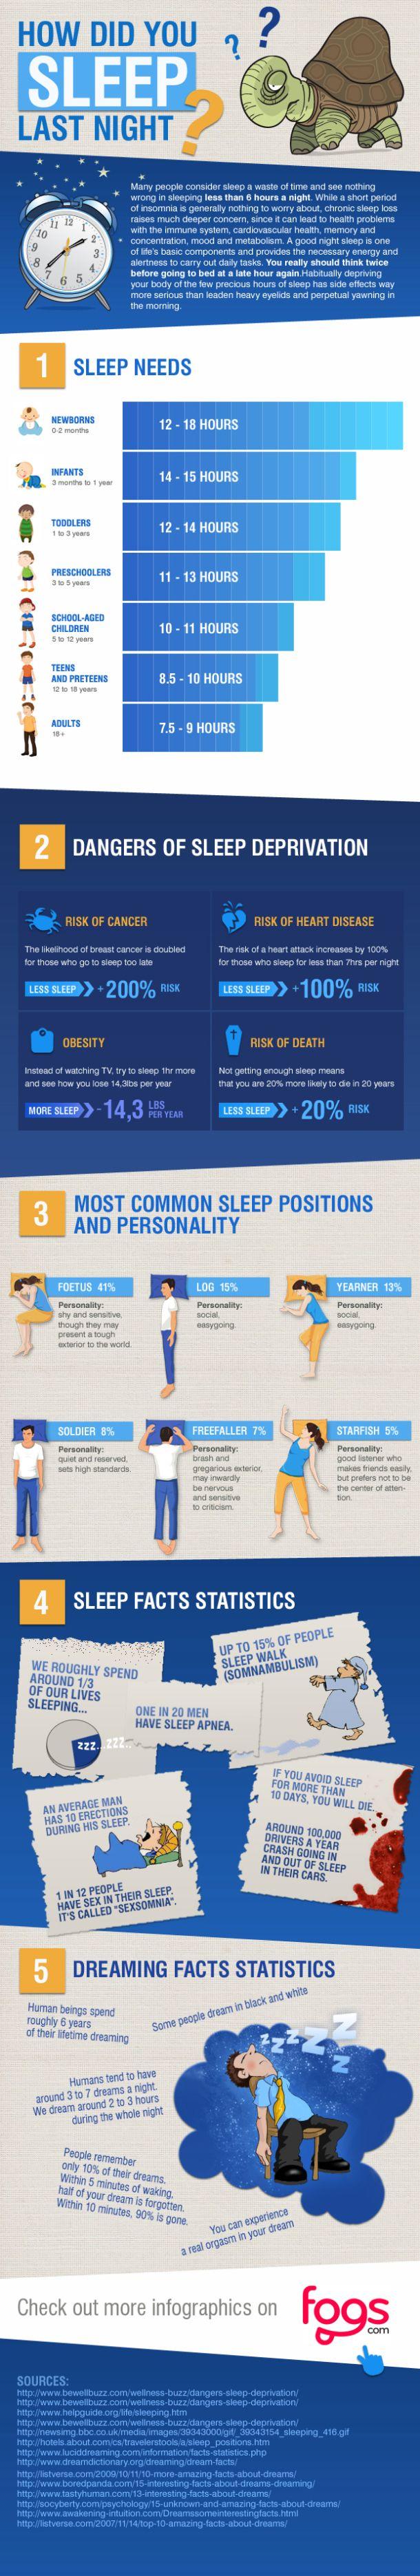 How Did You Sleep Last Night?[INFOGRAPHIC] #sleep